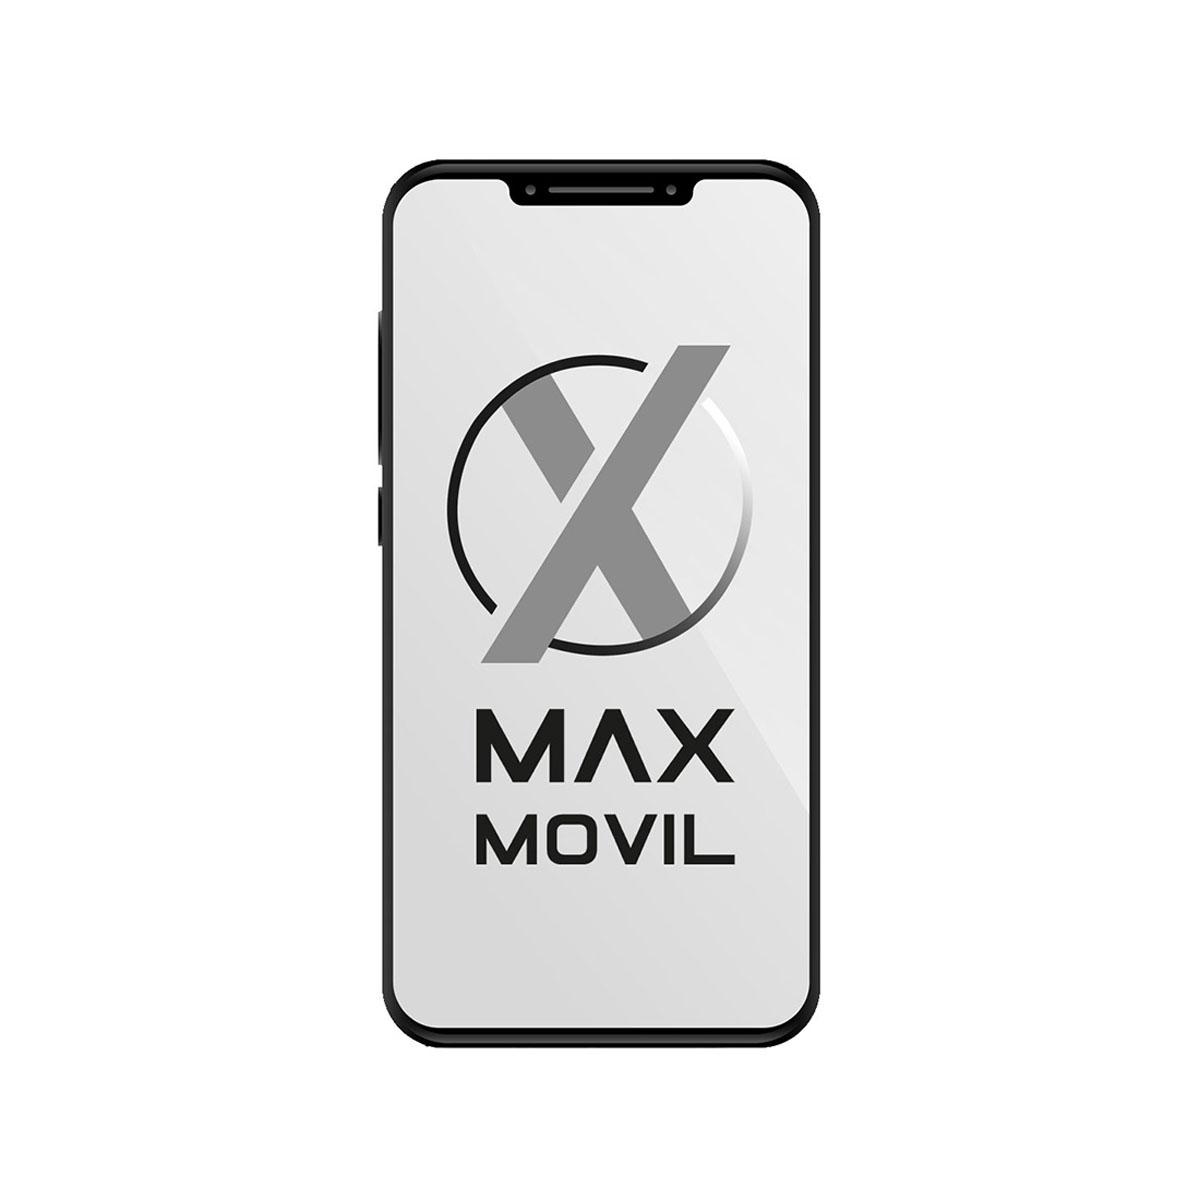 Tarjeta Memory Stick Micro M2 de 4GB